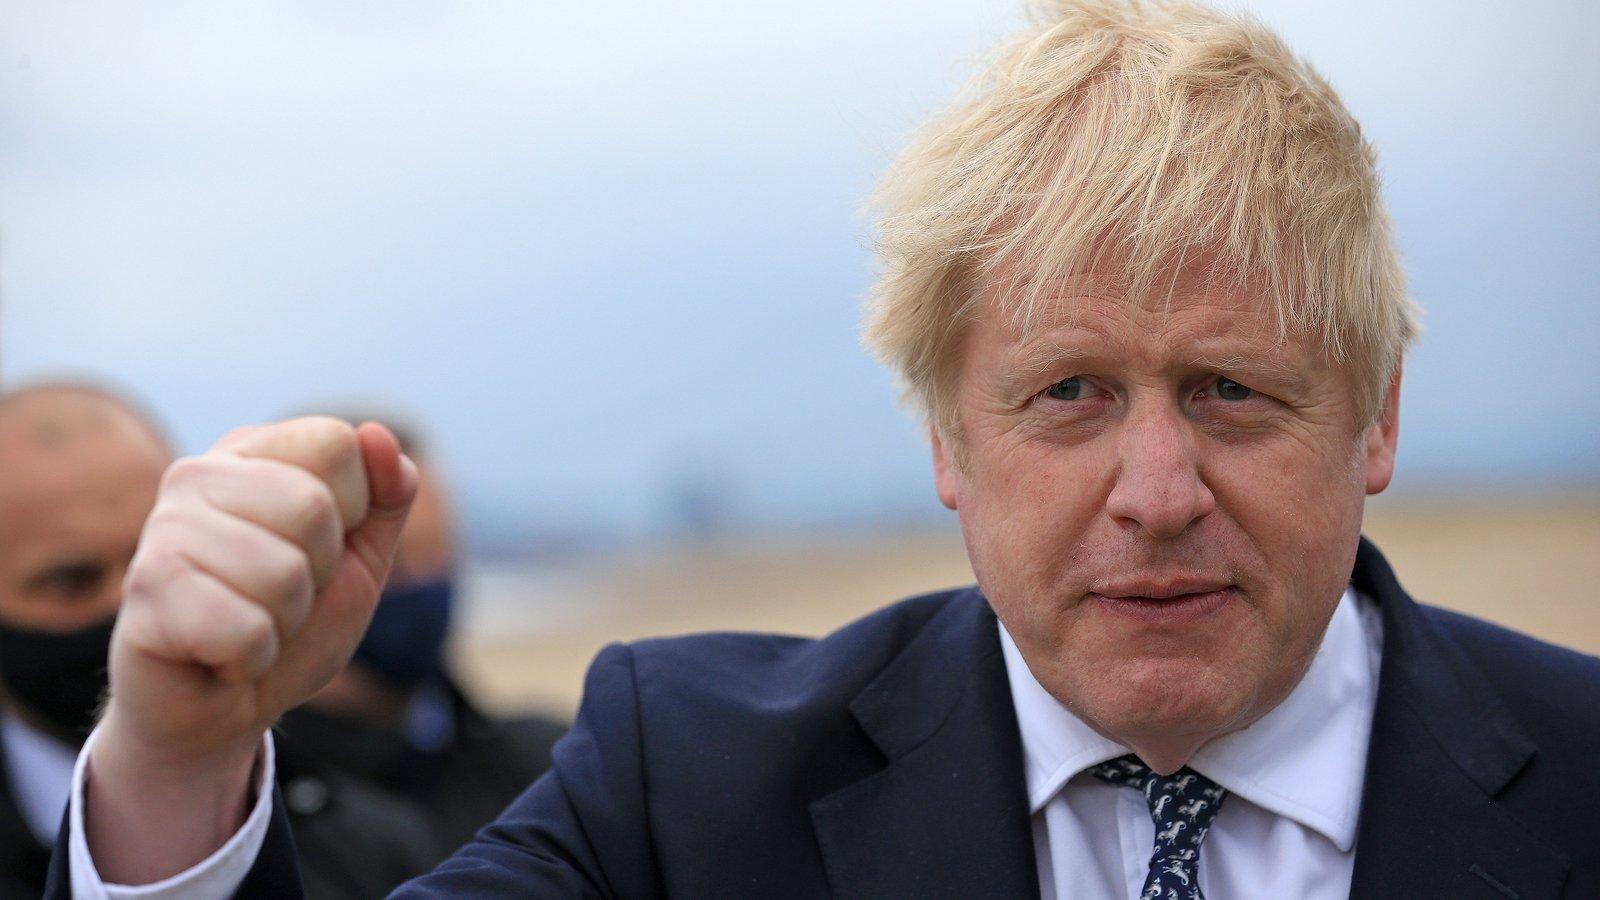 Johnson's Ballymurphy apology criticised